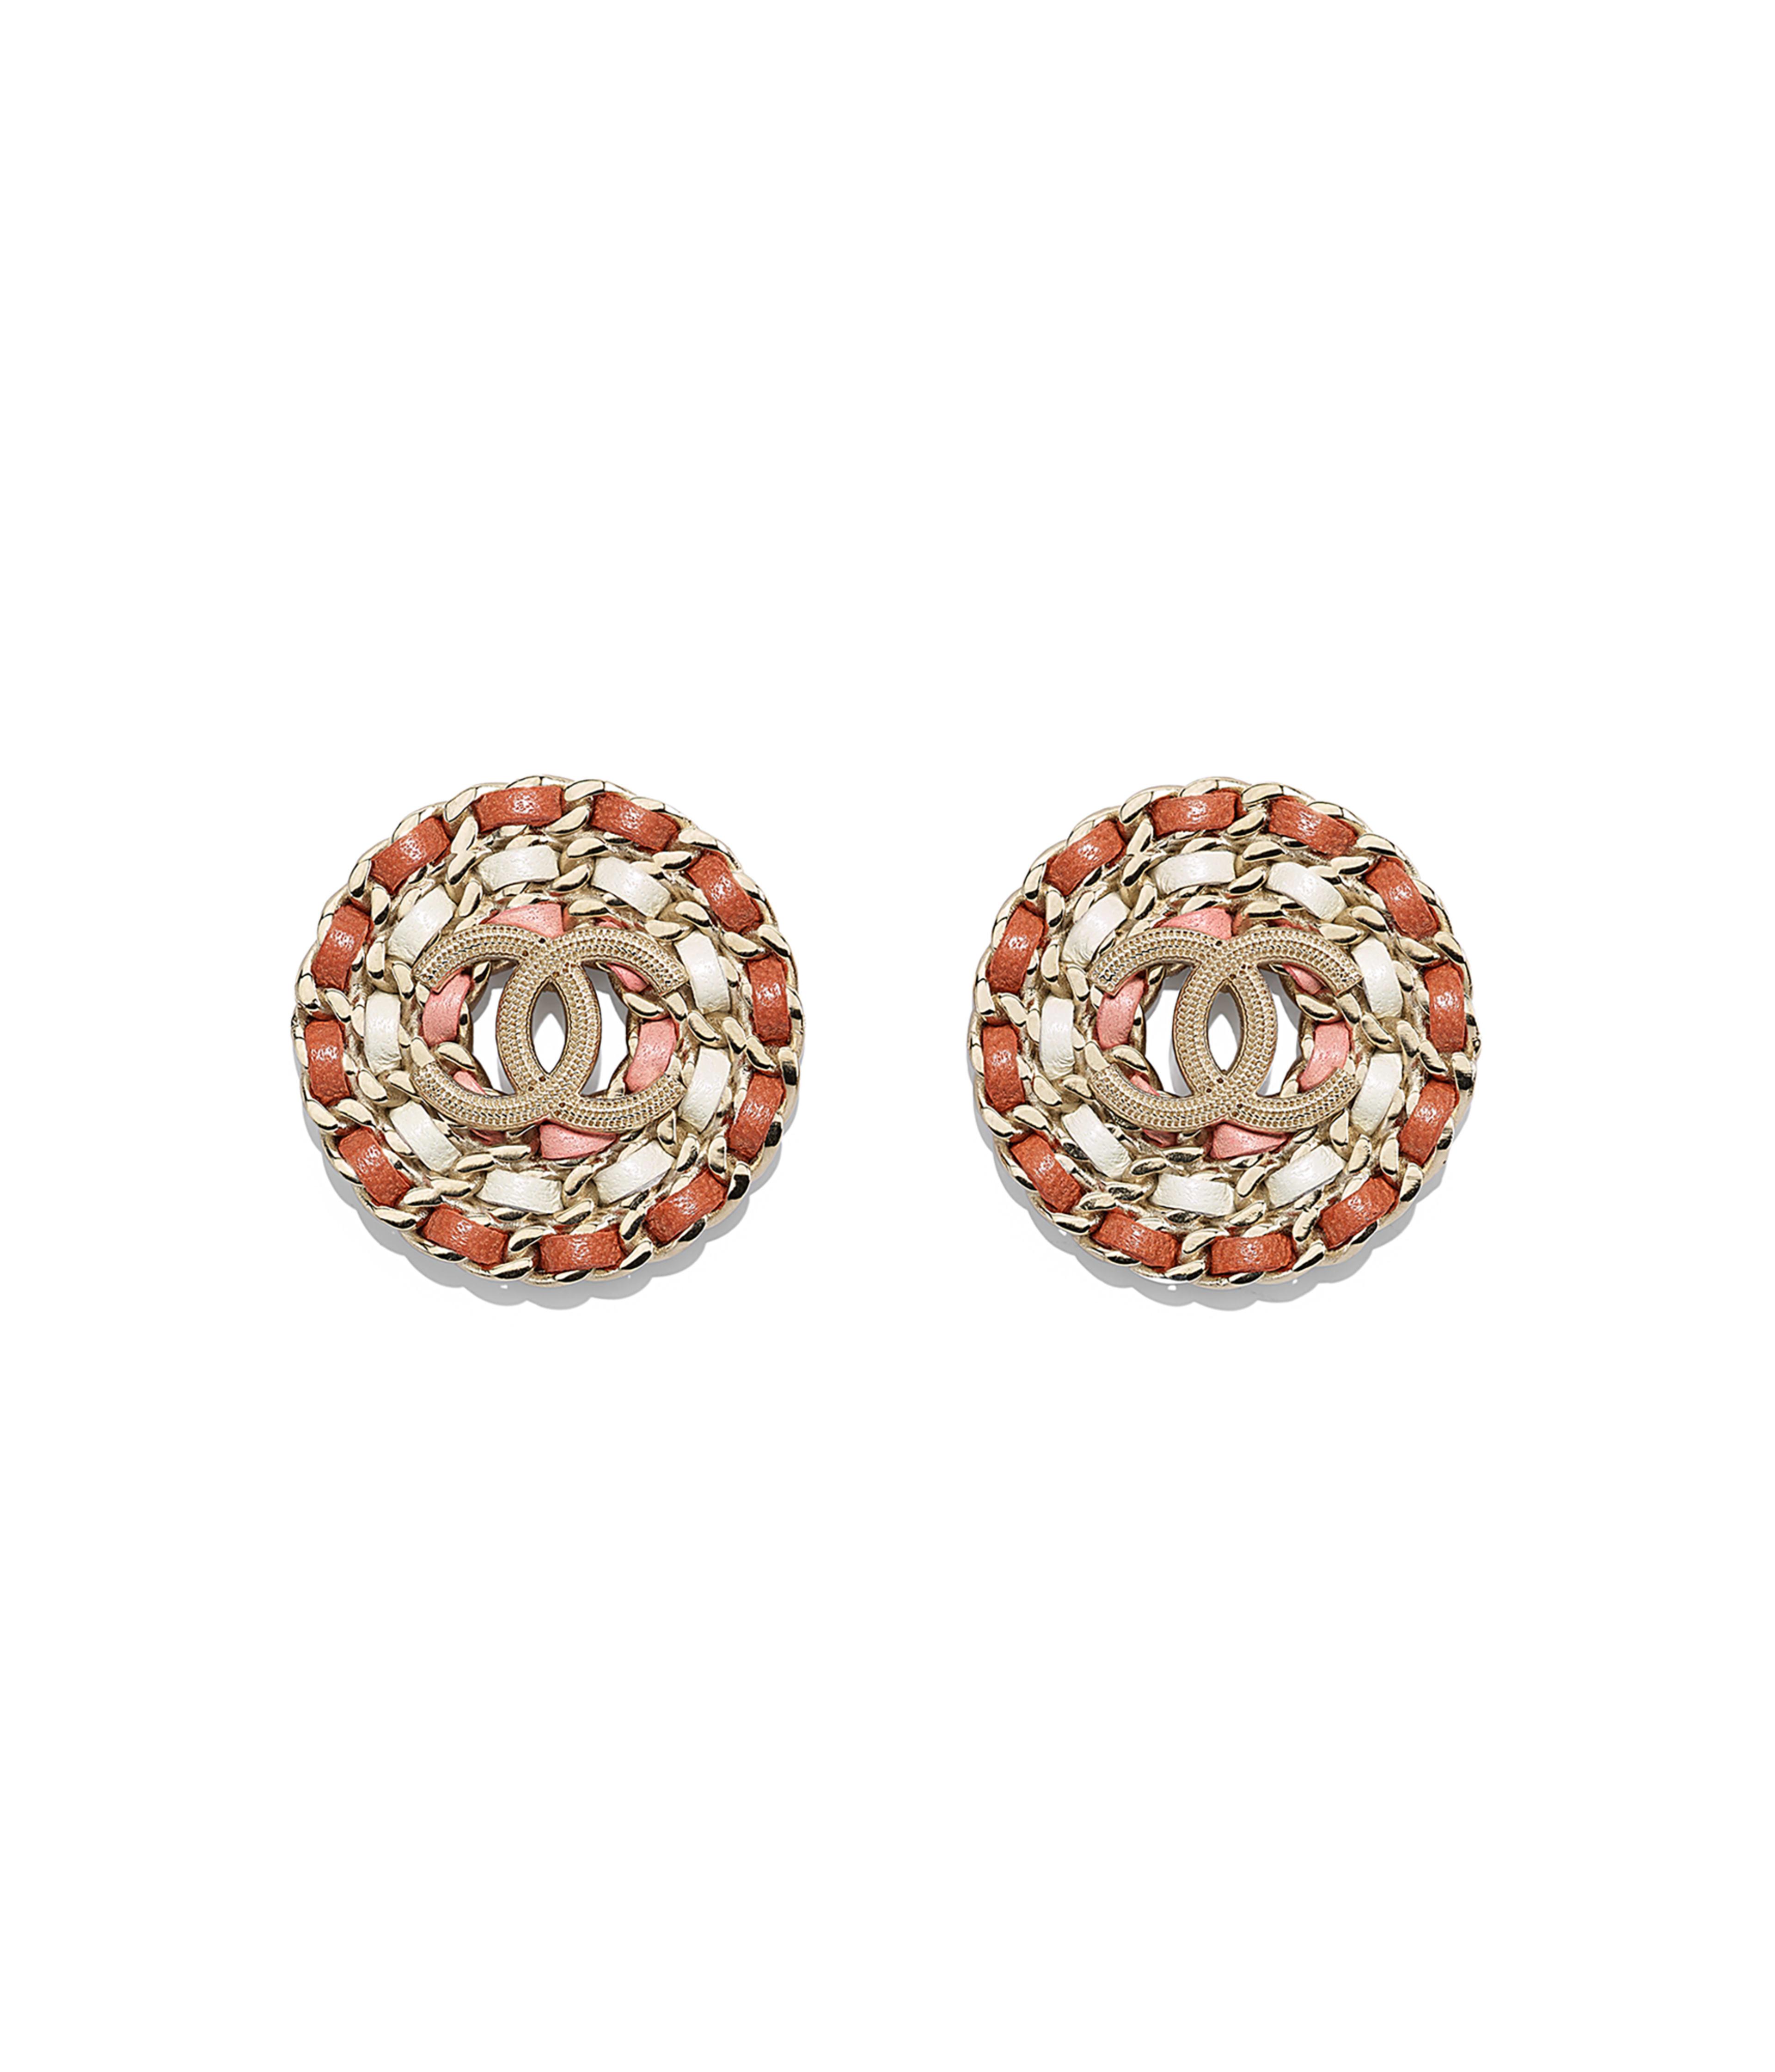 abdd06ee6837 Costume jewelry - Fashion